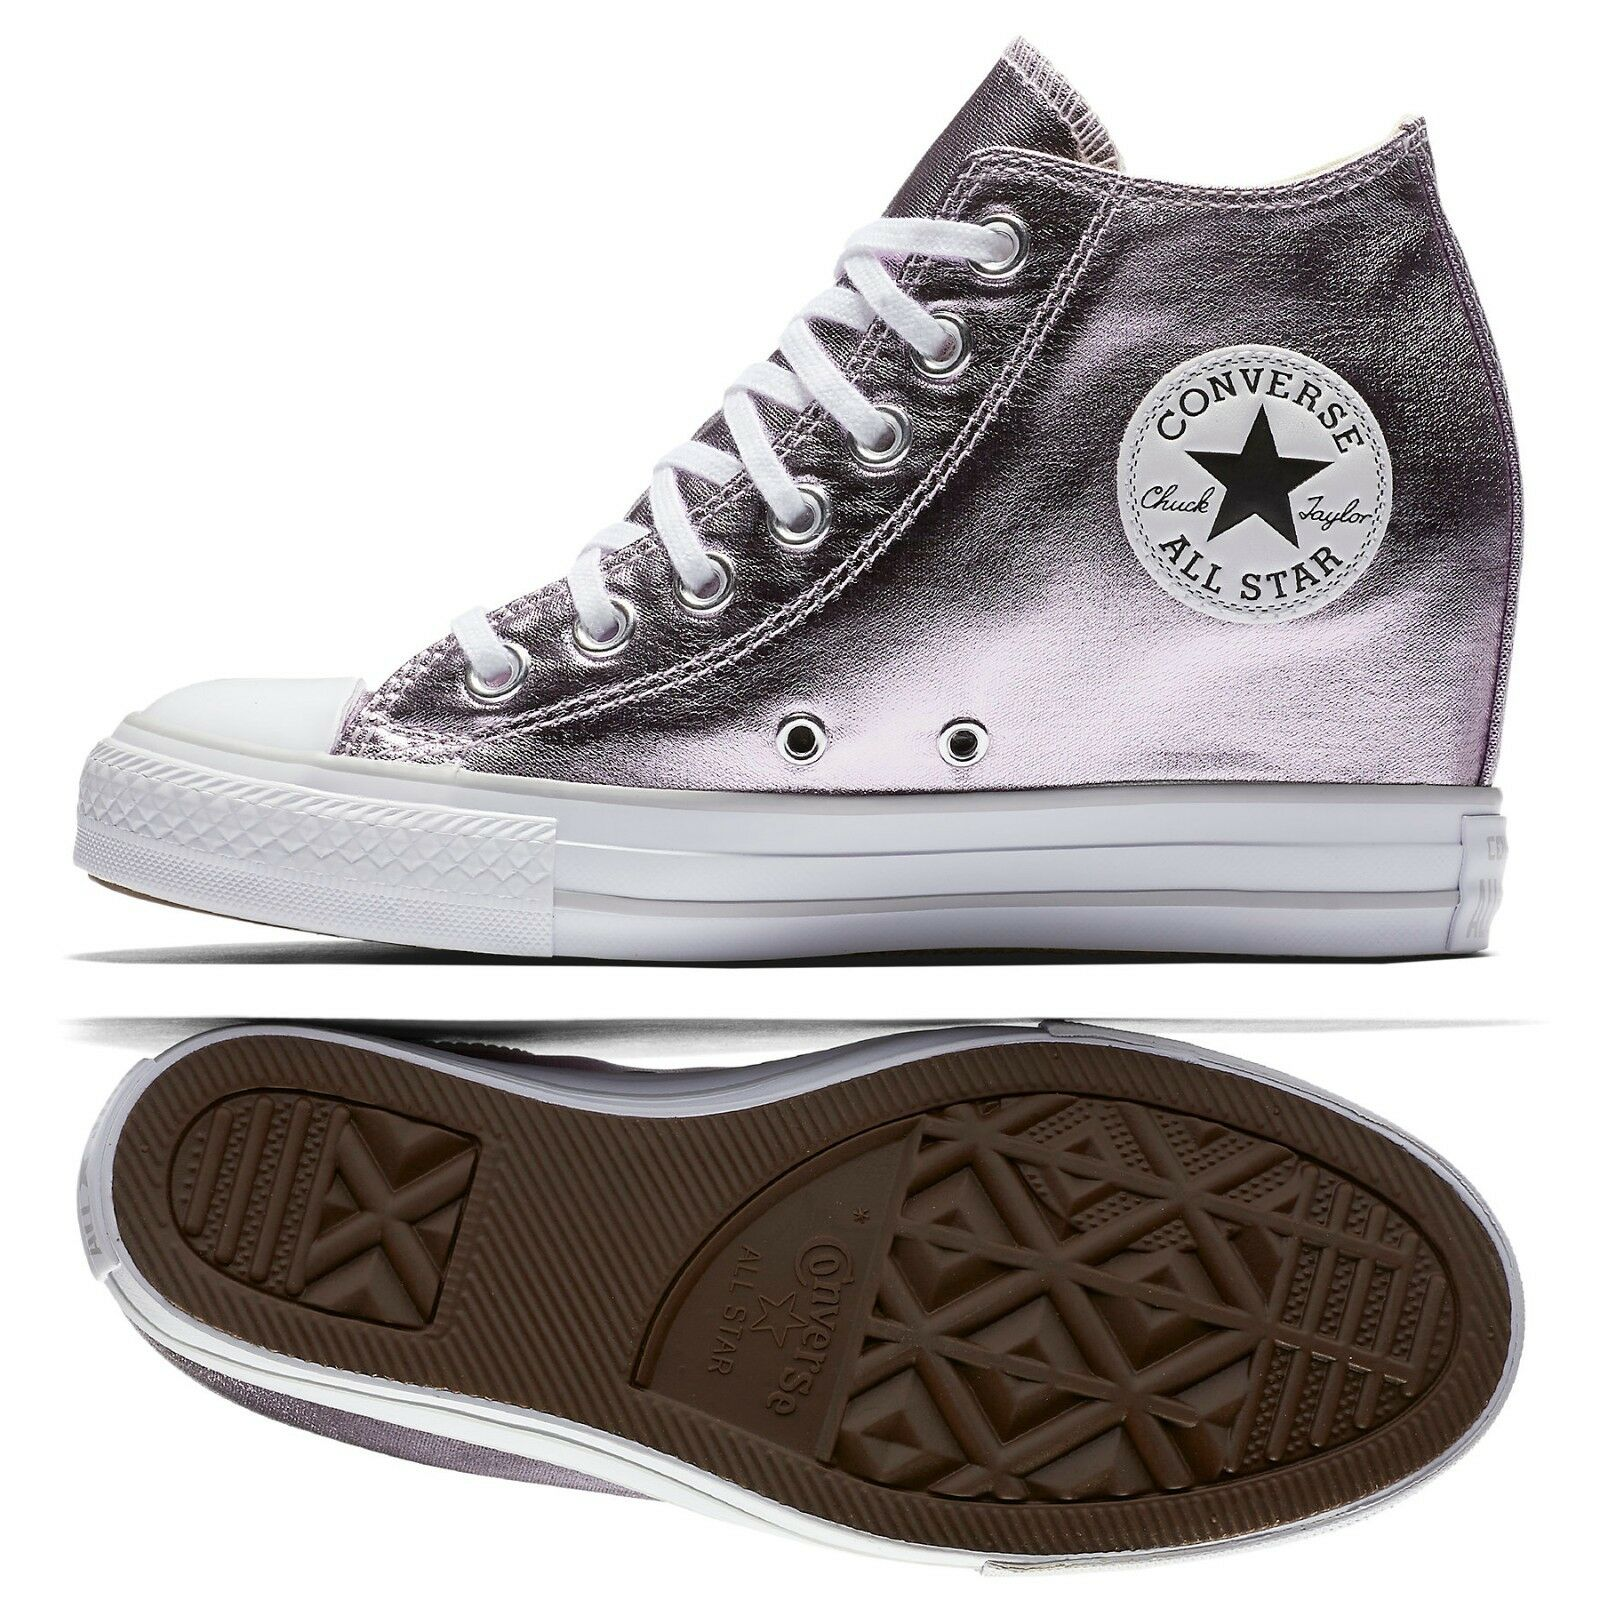 373074064b6 Converse Chuck Taylor Taylor Taylor All Star Lux Metálico Mid Top 556779 C  Púrpura Zapatos para